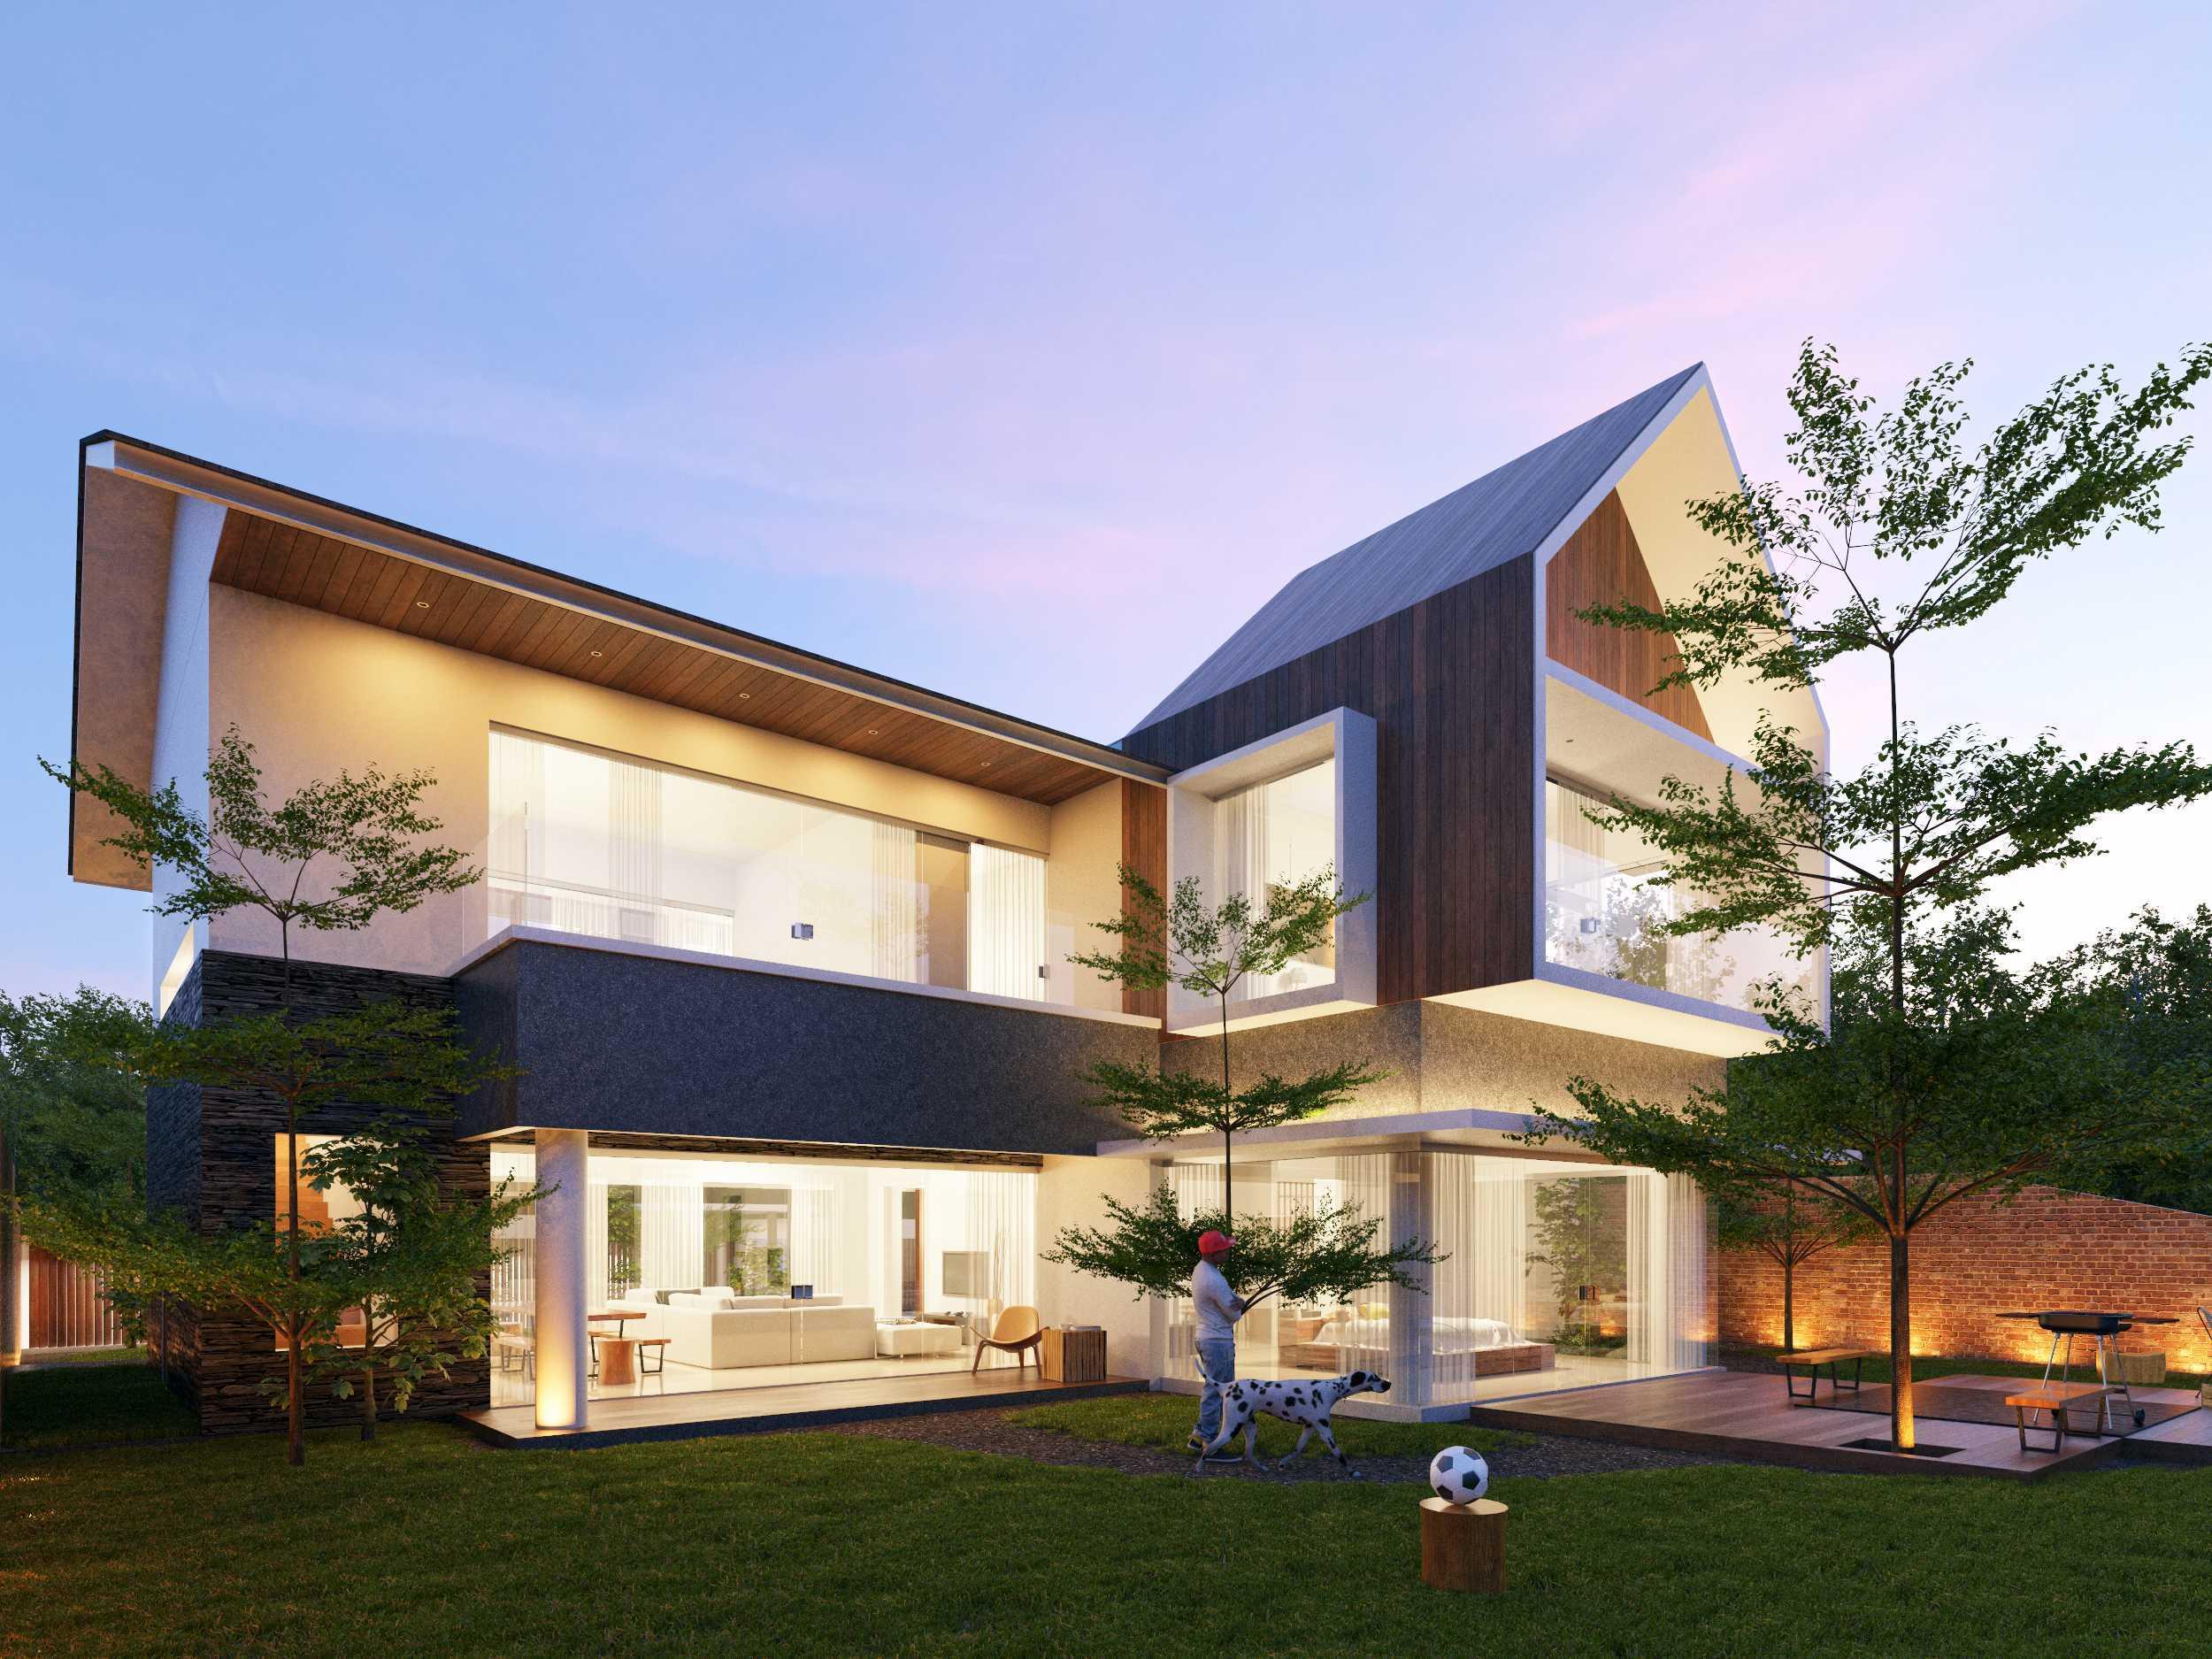 Sony Budiono & Partner Architect Firm Villa Kecil Pulau Putri Pulau Putri, Indonesia Pulau Putri, Indonesia Facade View Contemporary  42782